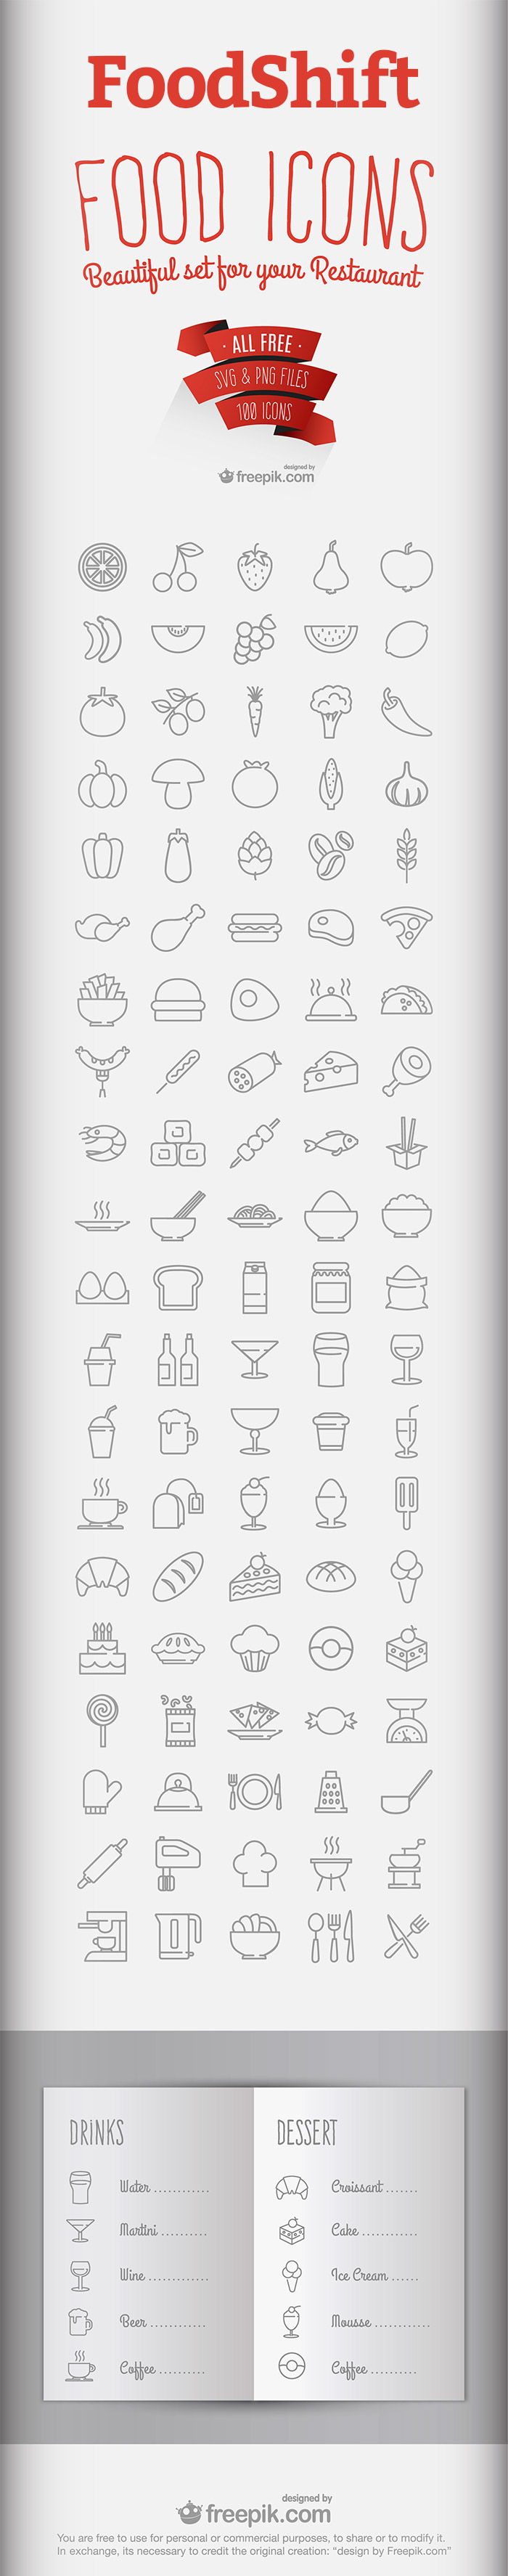 foodshift-free-food-icon-set-01